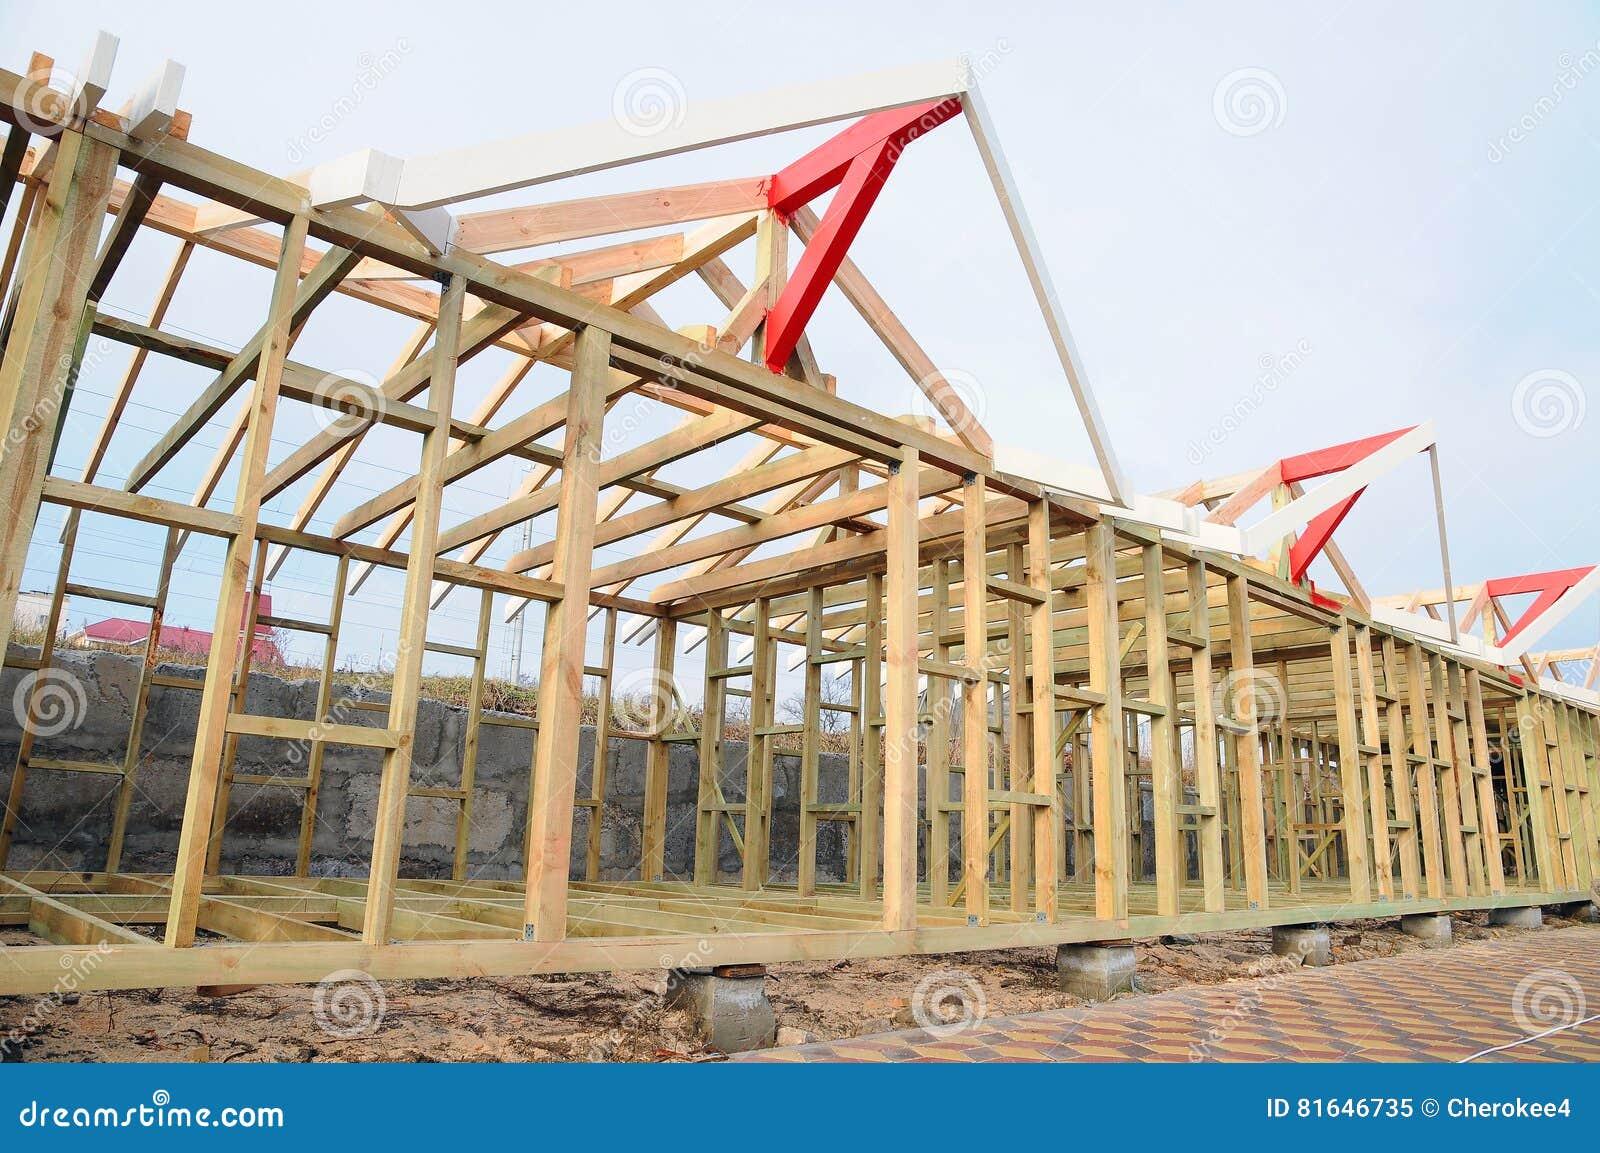 Casas de estructura de madera casas de estructura de - Estructura tejado madera ...